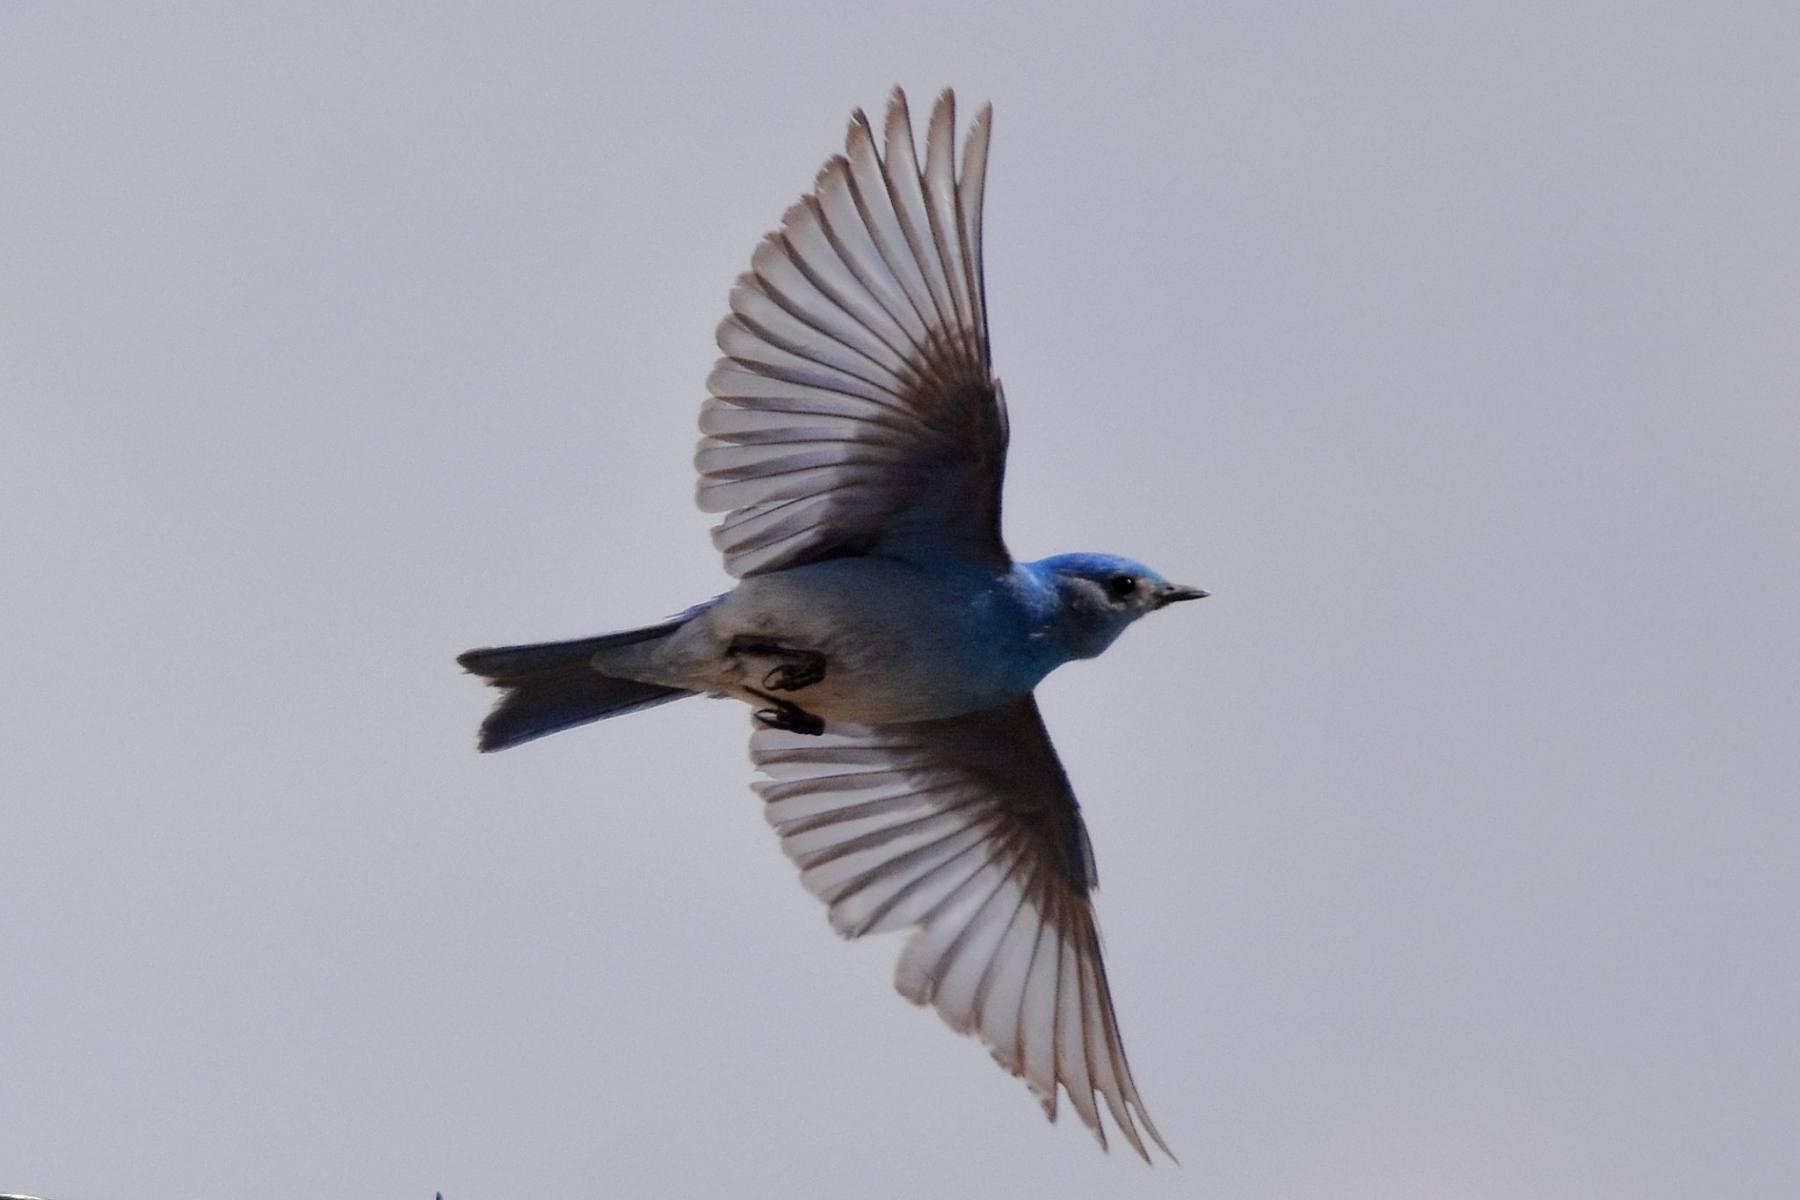 Mountain Bluebird by David Mundy